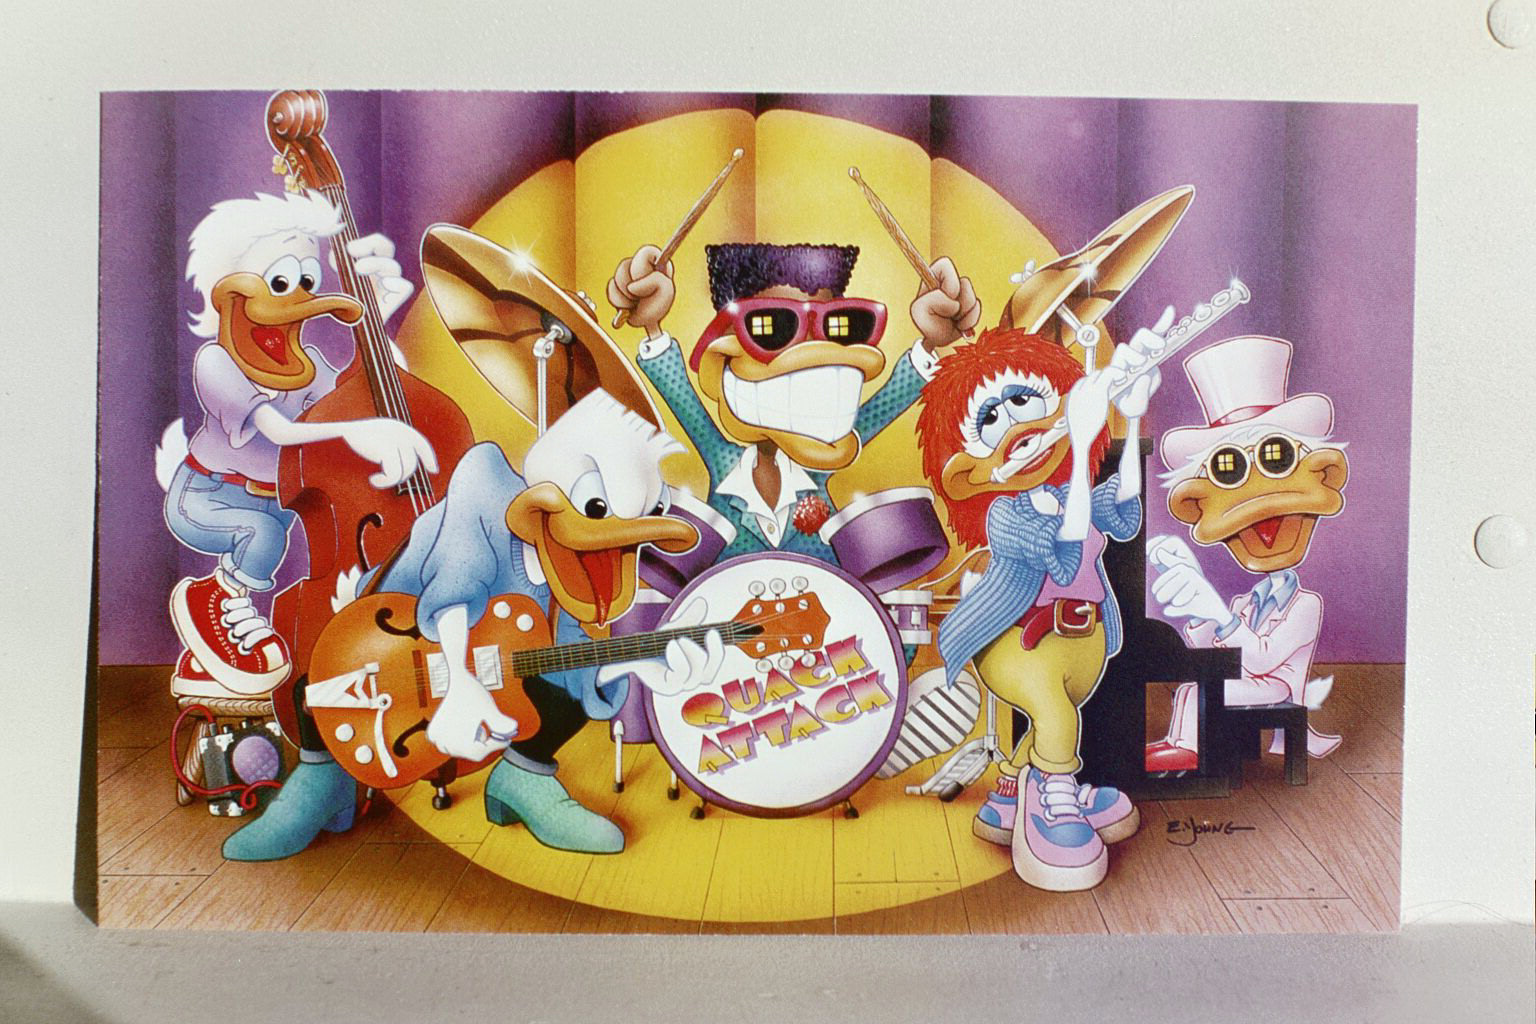 pato-donald-imagem-animada-0017